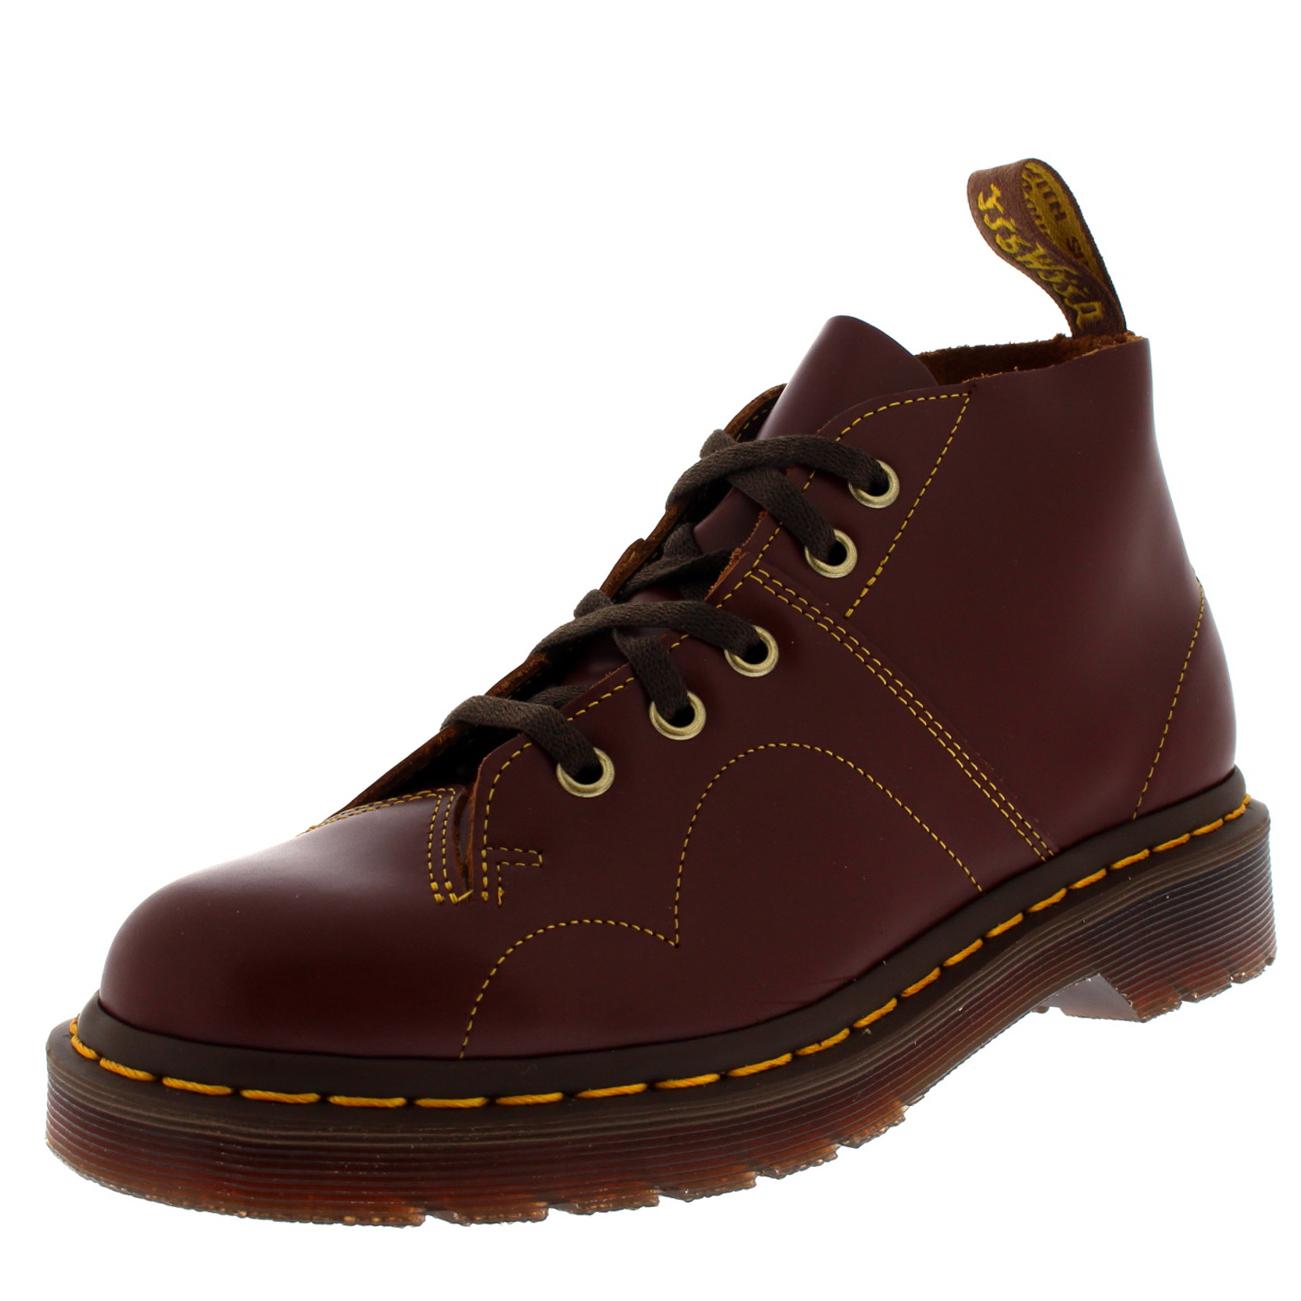 c5f40c774b Dr Martens Church 16054001 Black Vintage Smooth BOOTS Uk9 for sale ...